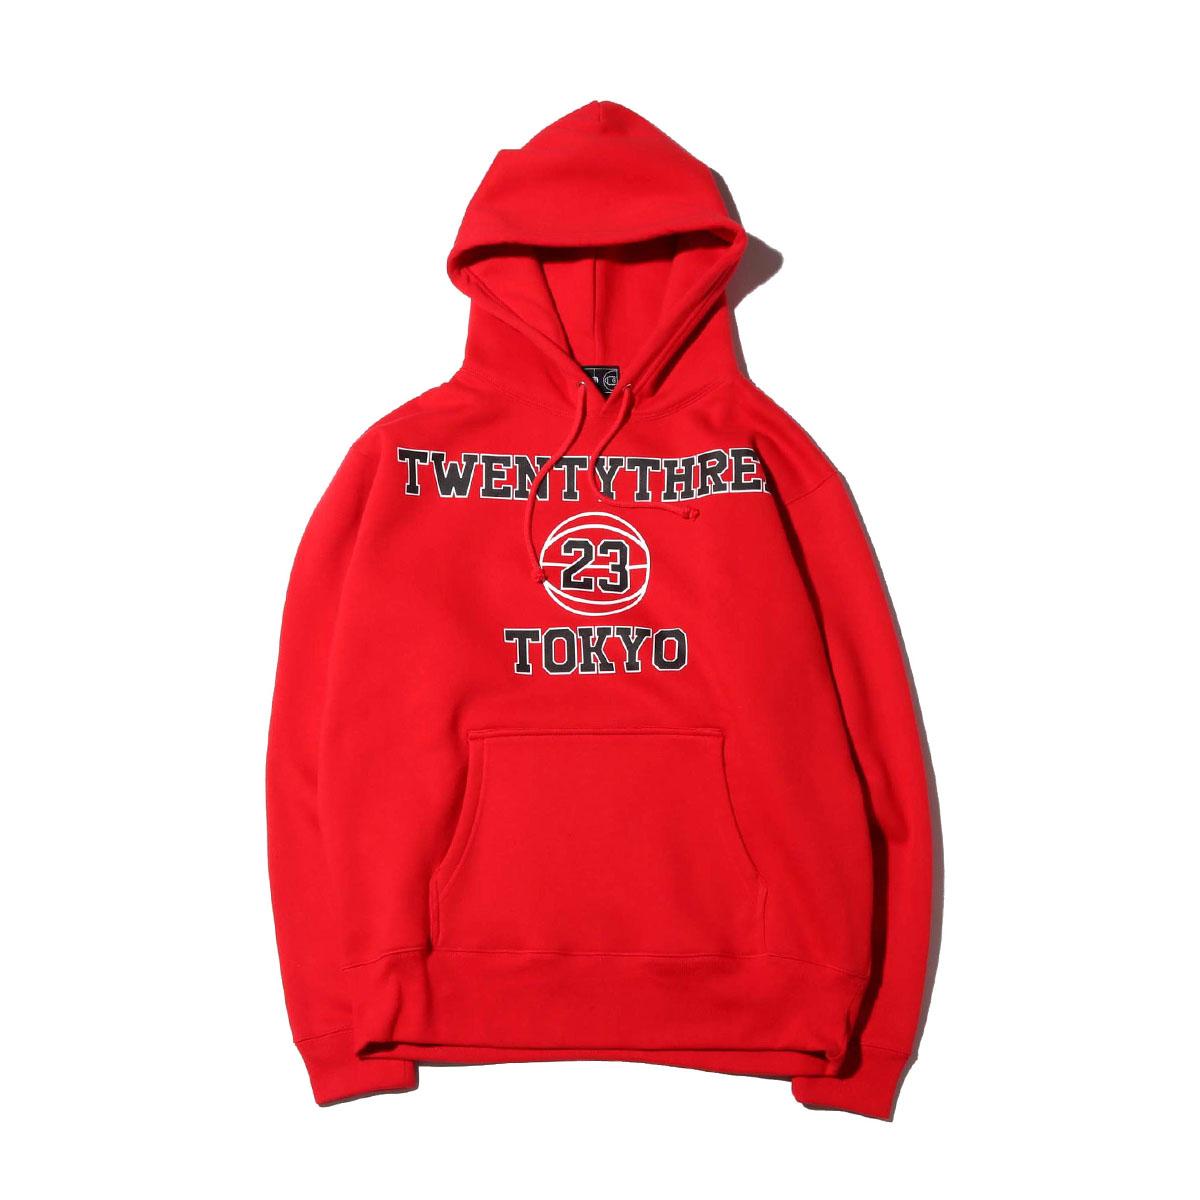 TOKYO 23 COLLEGE HOODIE(RED)(トウキョウ23 カレッジ フーディー)【メンズ】【パーカー】【19HO-I】